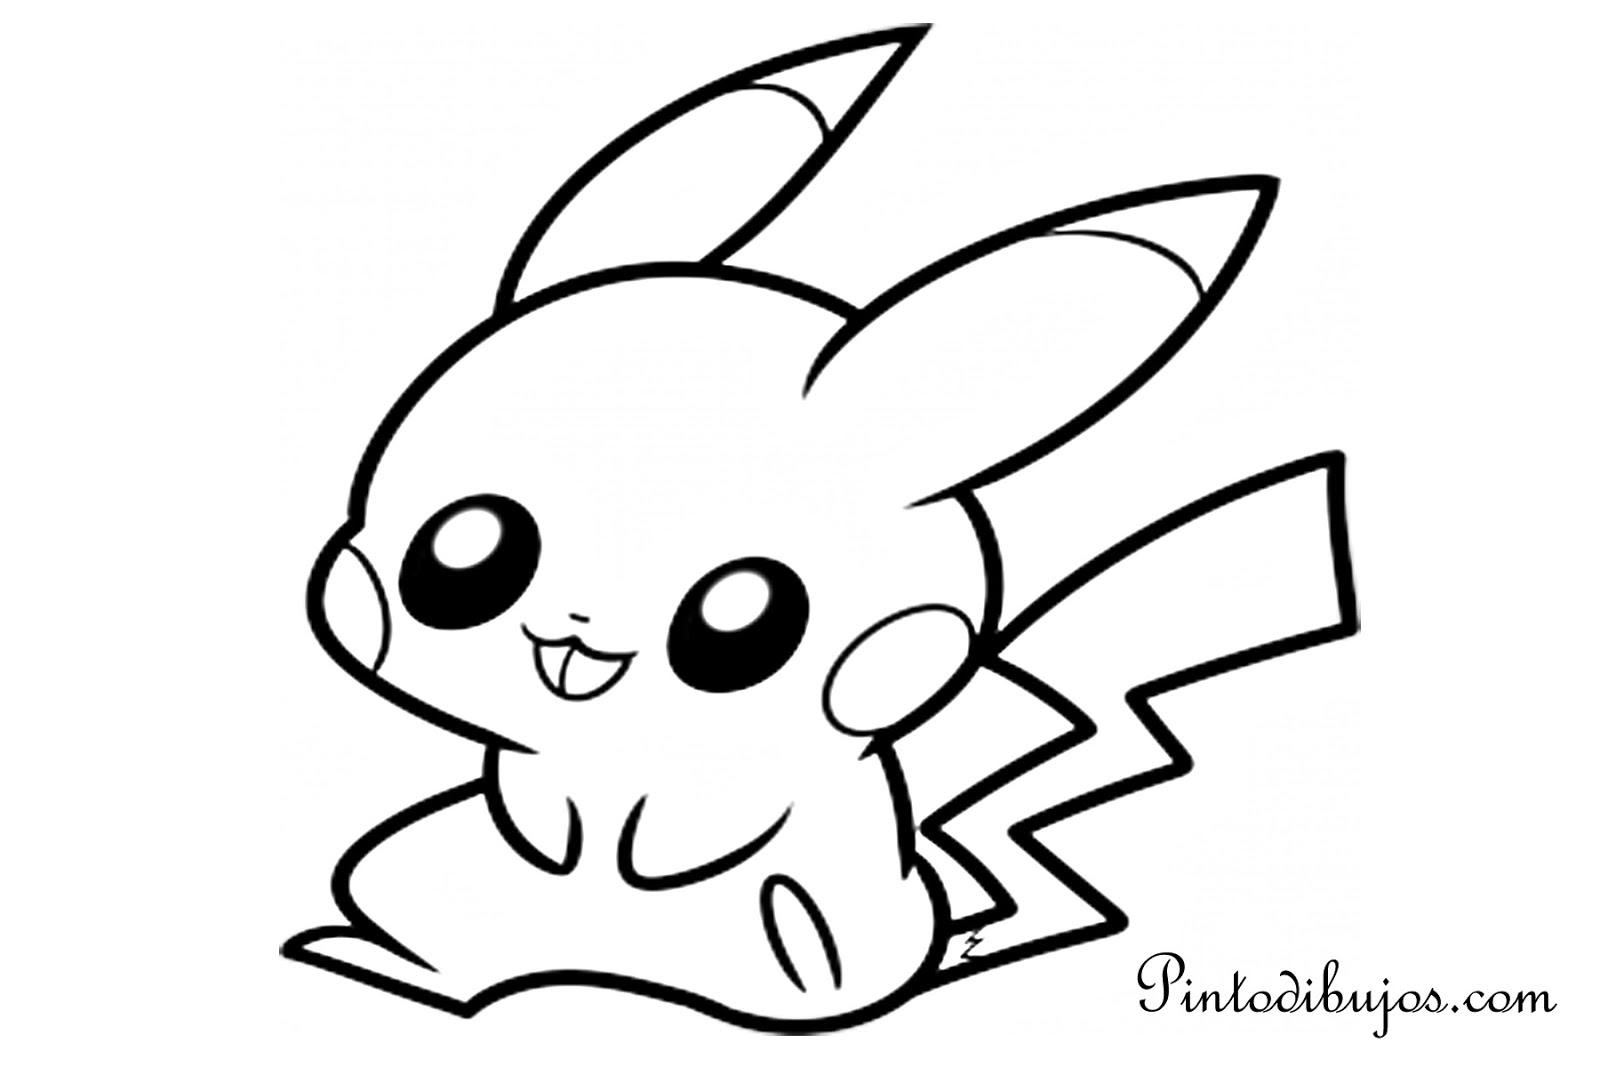 Famoso Lindo Bebé Pikachu Para Colorear Embellecimiento - Dibujos ...